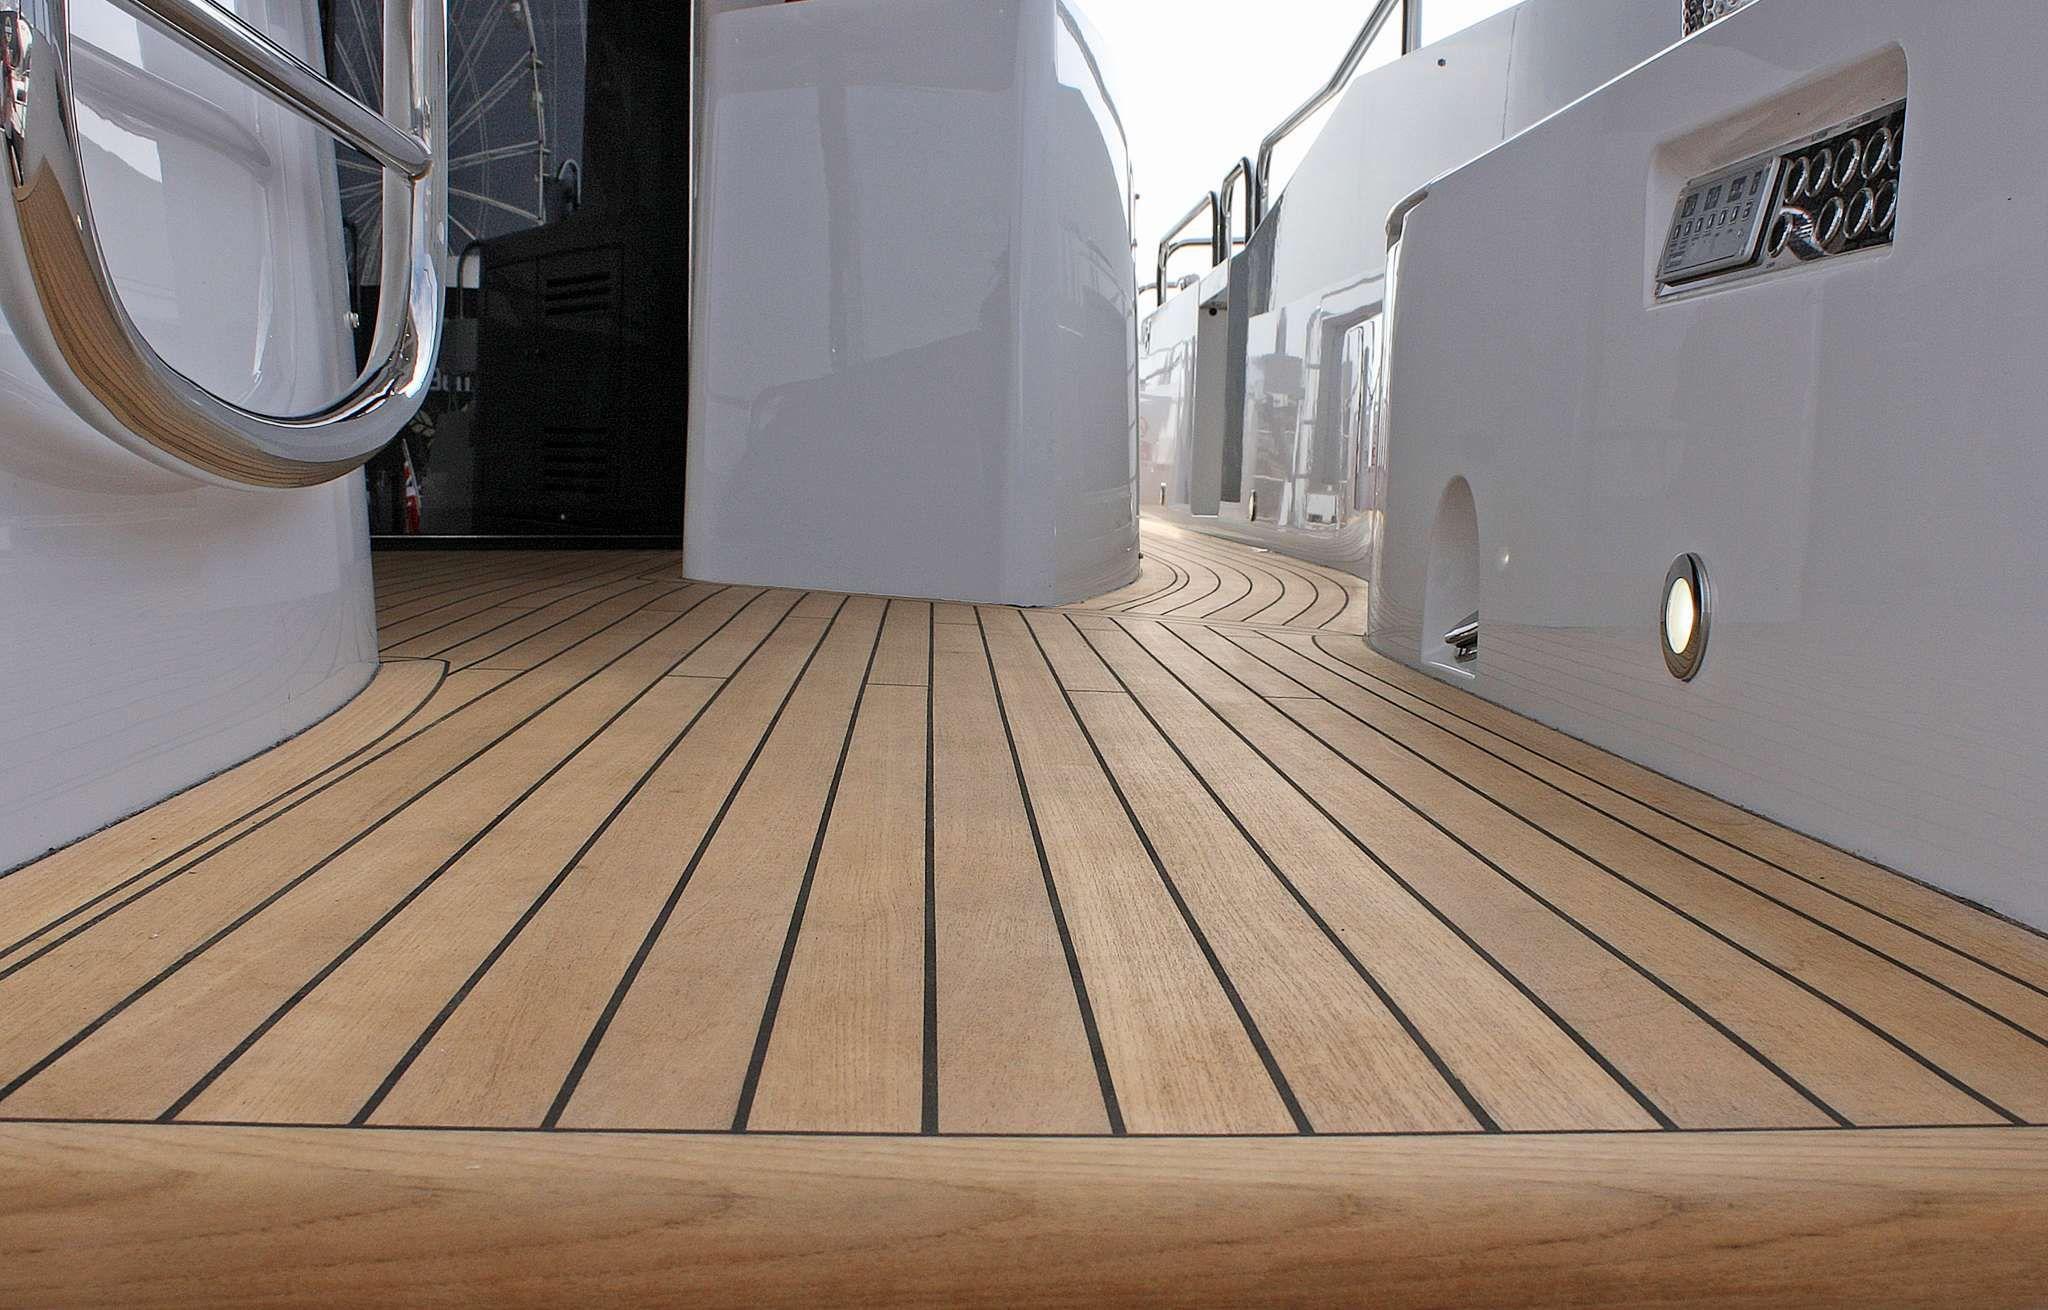 boat vinyl floor material Singapore, boat new floor